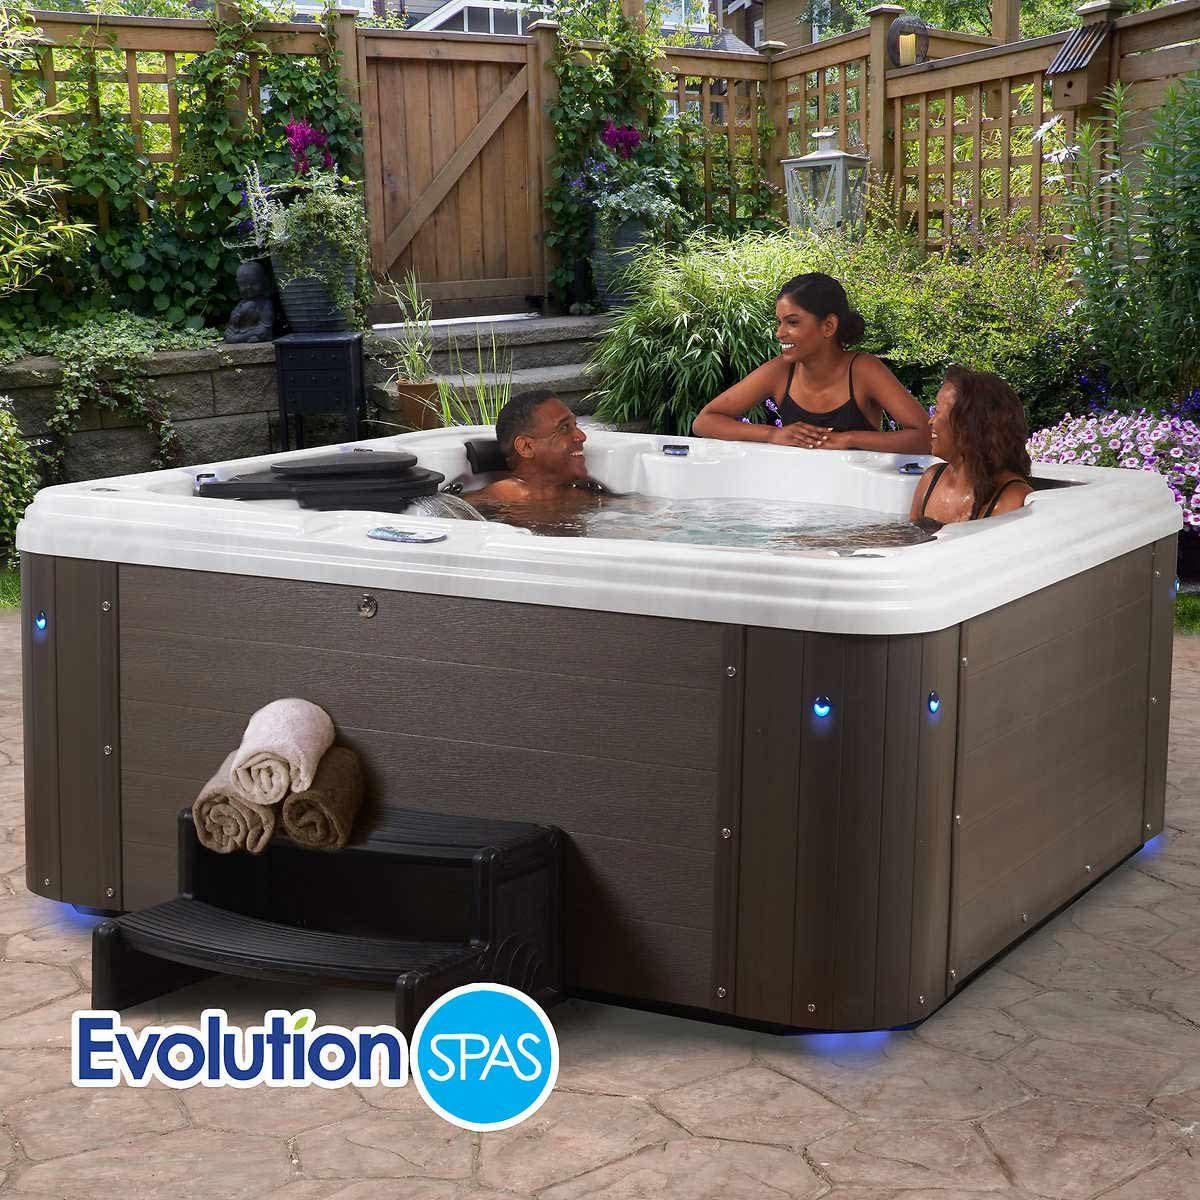 evolution spa hot tub